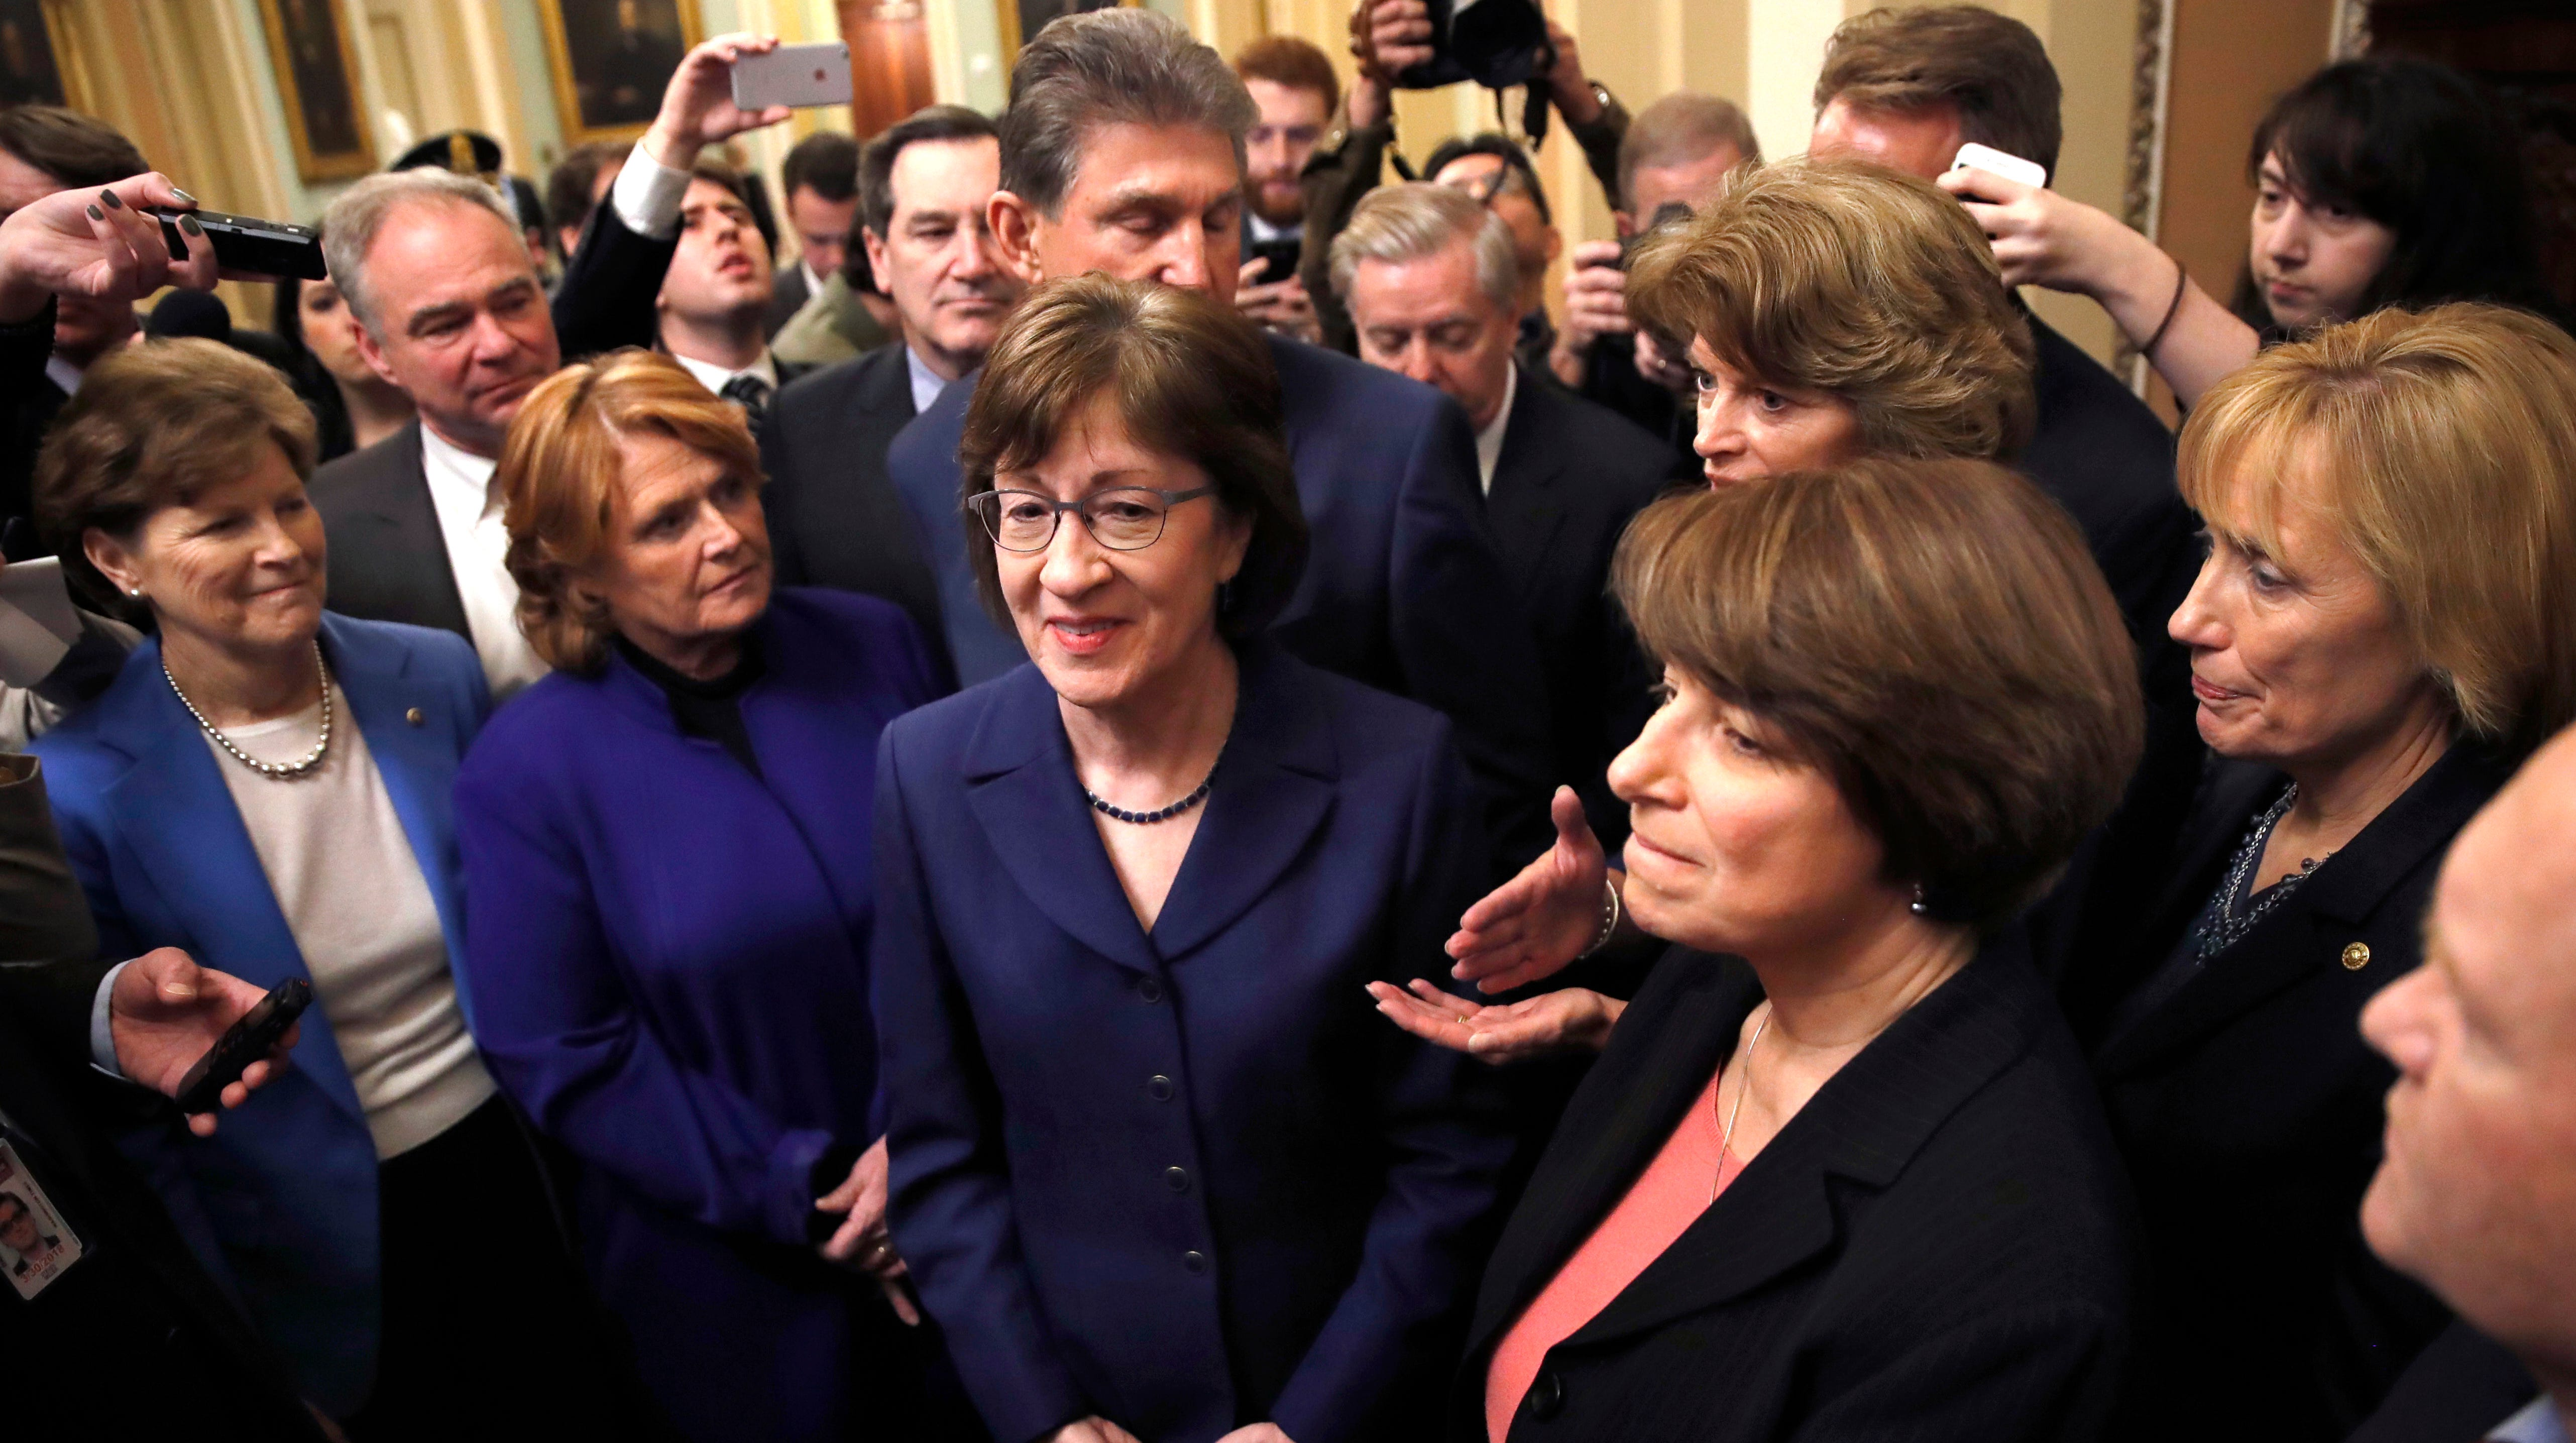 Sen. Susan Collins, R-Maine, center, and a bipartisan group of senators are pictured at the Capitol in Washington, Monday, Jan. 22, 2018. From left are, Sen. Jeanne Shaheen, D-N.H., former Sen. Heidi Heitkamp, D-N.D., Collins, behind Collins is Sen. Joe Manchin, D-W.Va., Sen. Lisa Murkowski, R-Alaska, Sen. Amy Klobuchar, D-Minn., and Sen. Maggie Hassan, D-N.H.